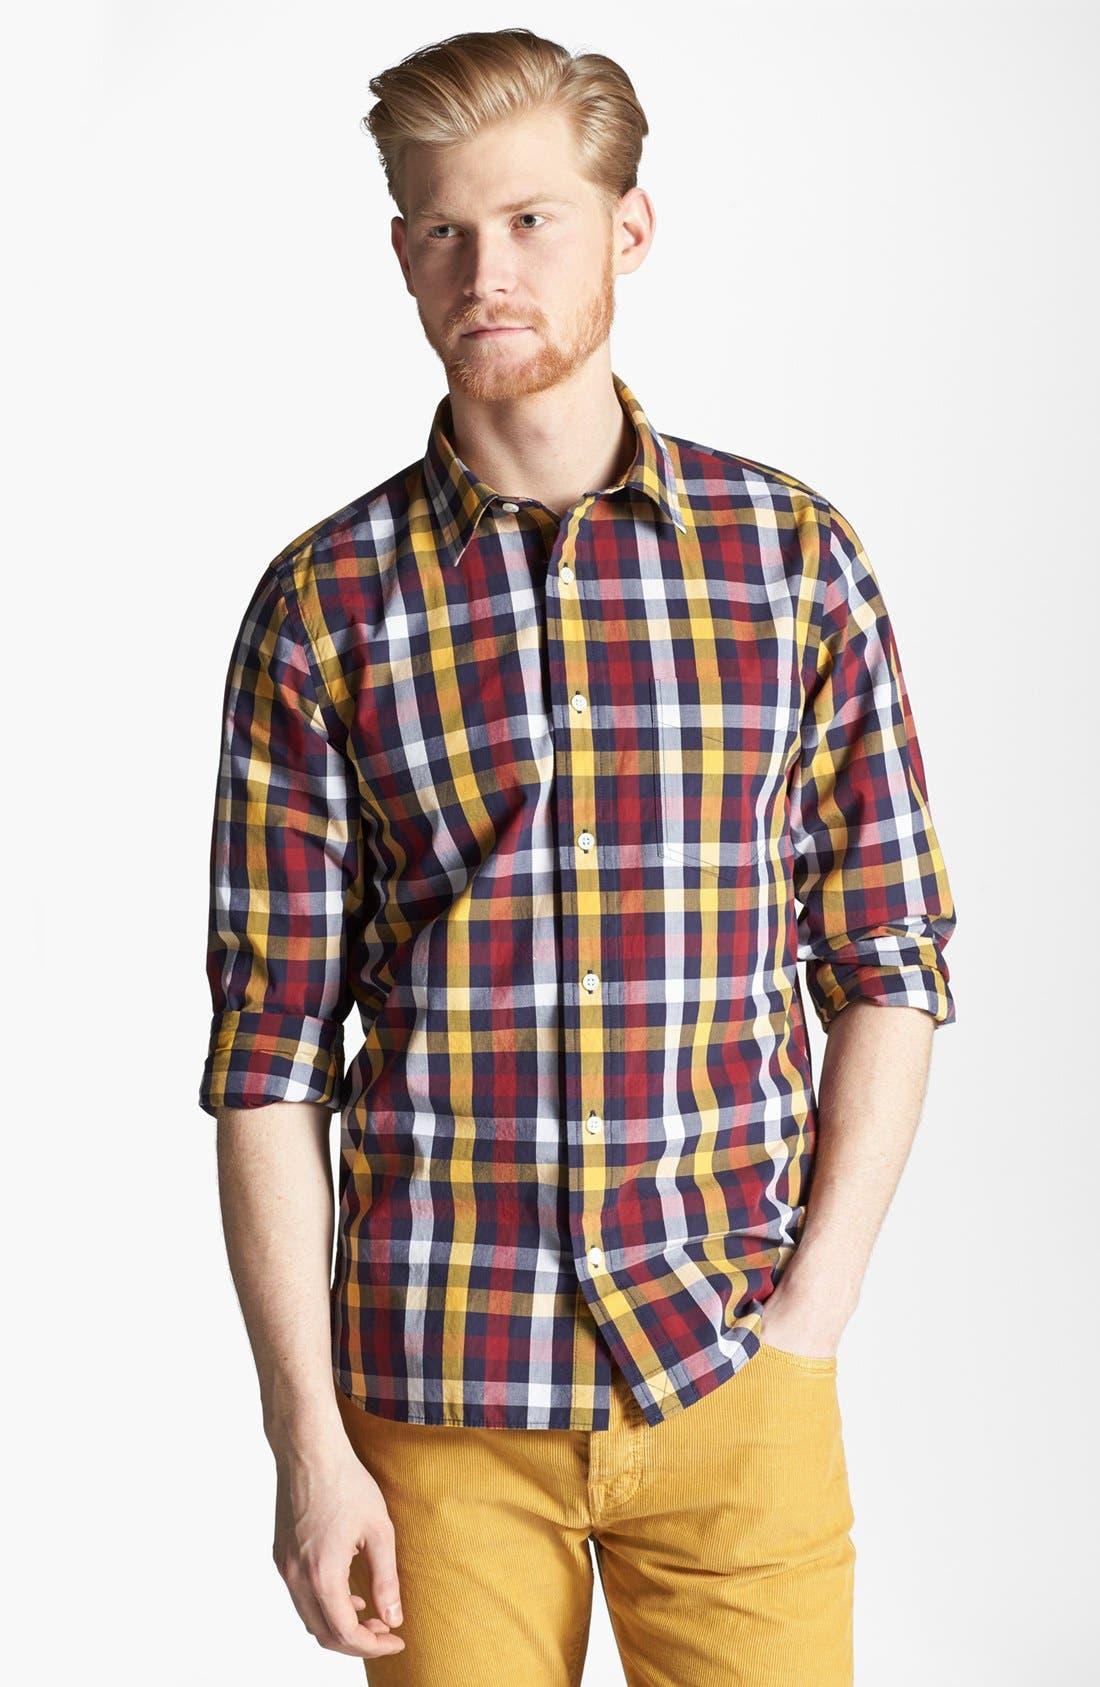 Main Image - Jack Spade 'Sid' Plaid Woven Shirt